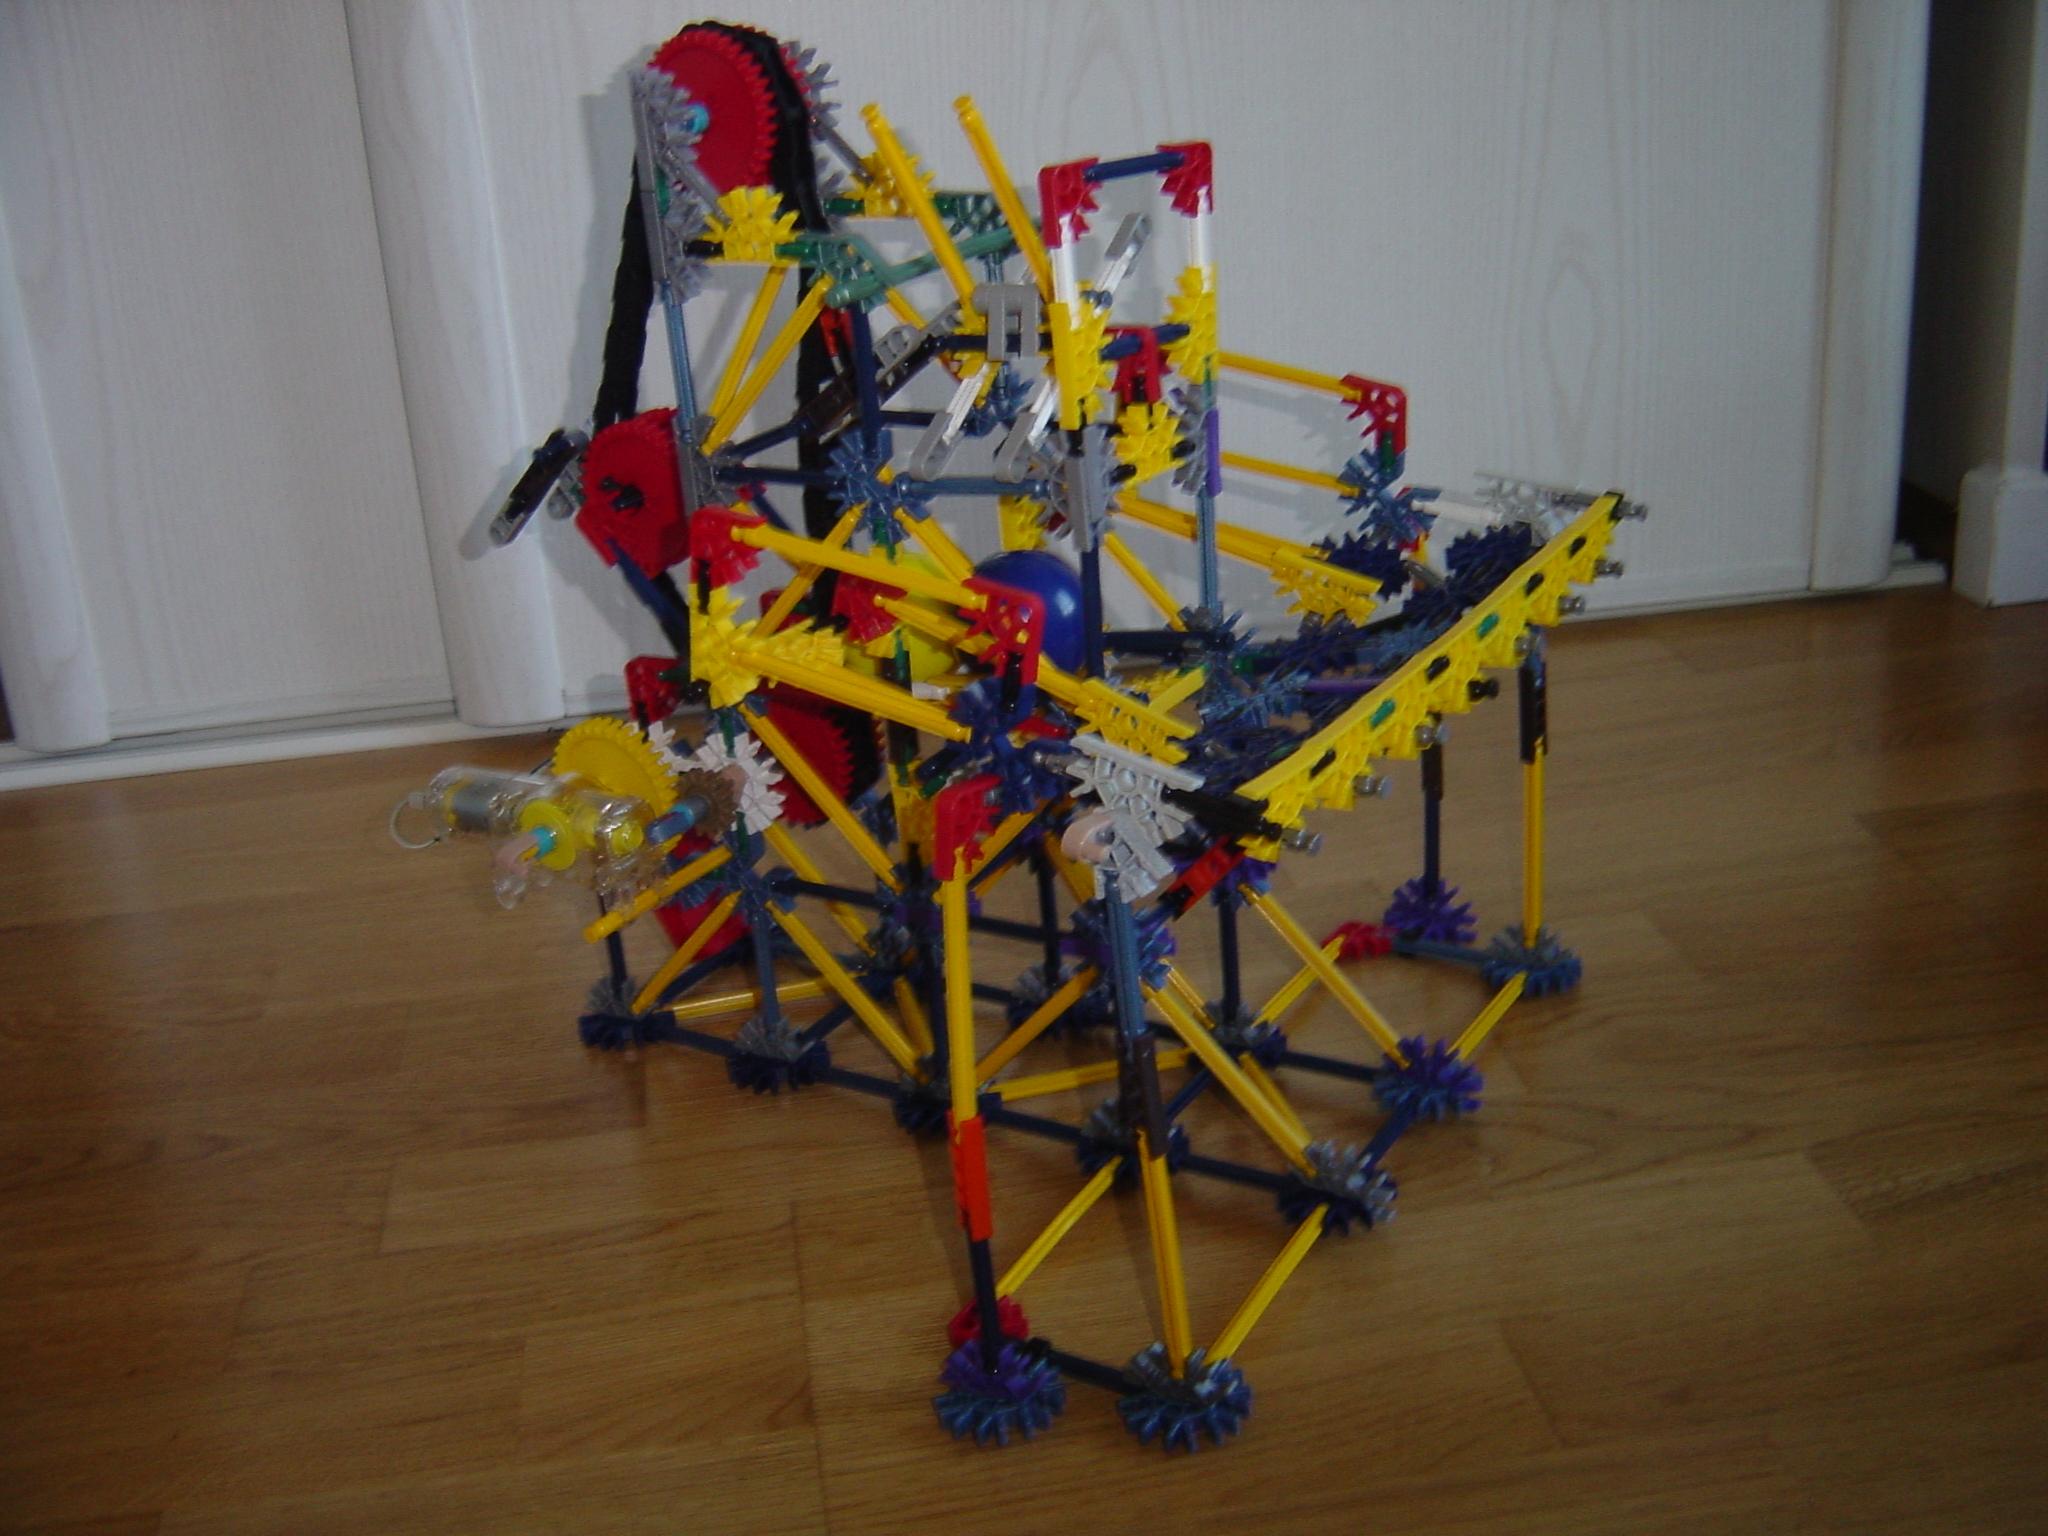 Project S (Knex Ball Machine)